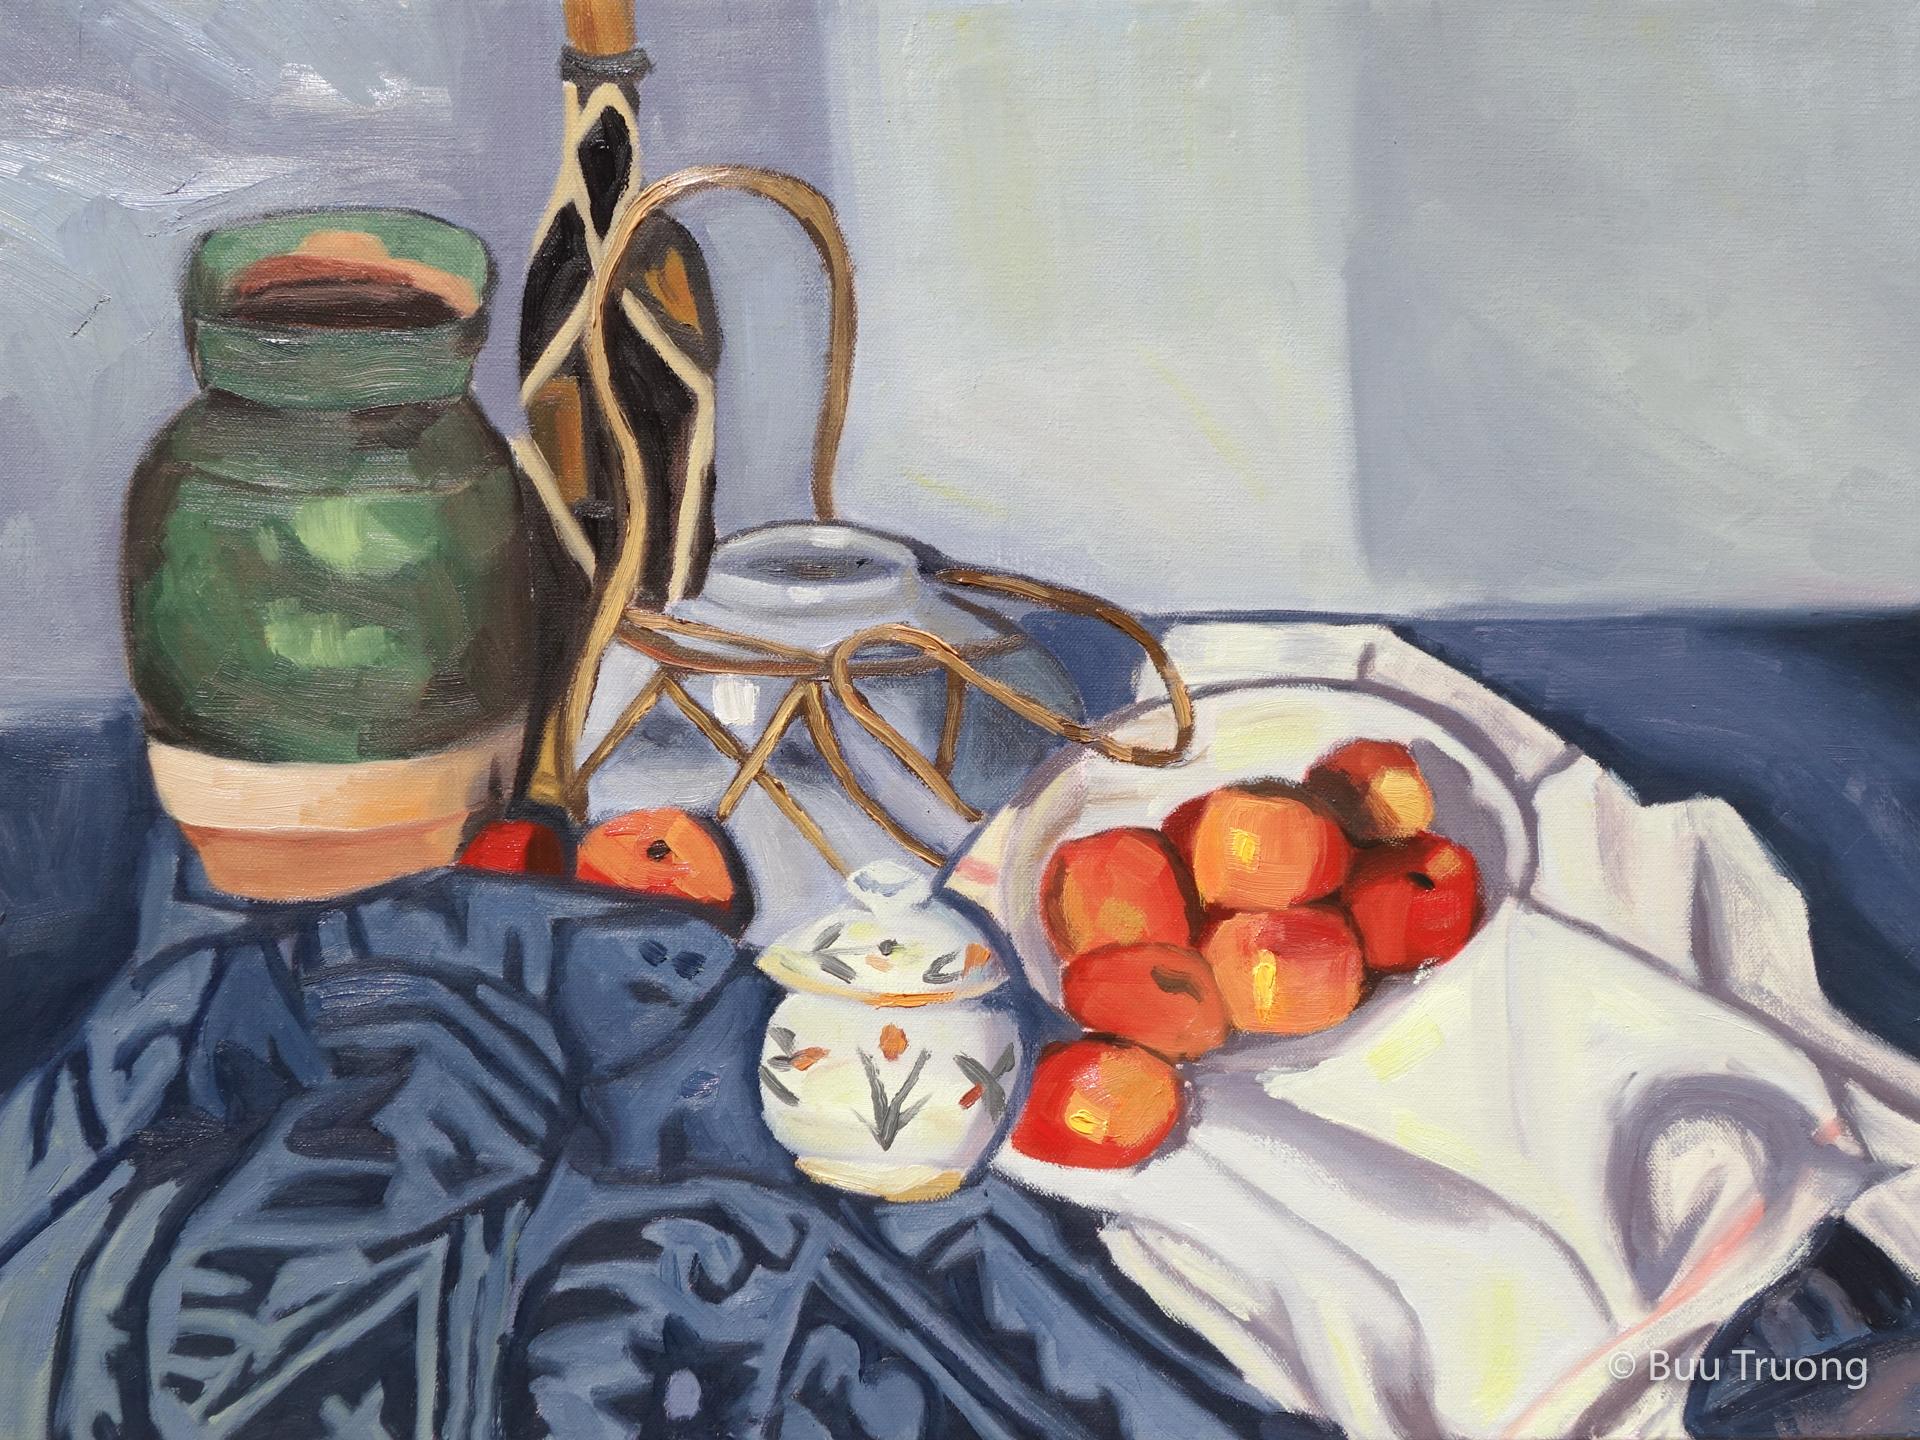 Study of Cezanne's Apples Still-Life